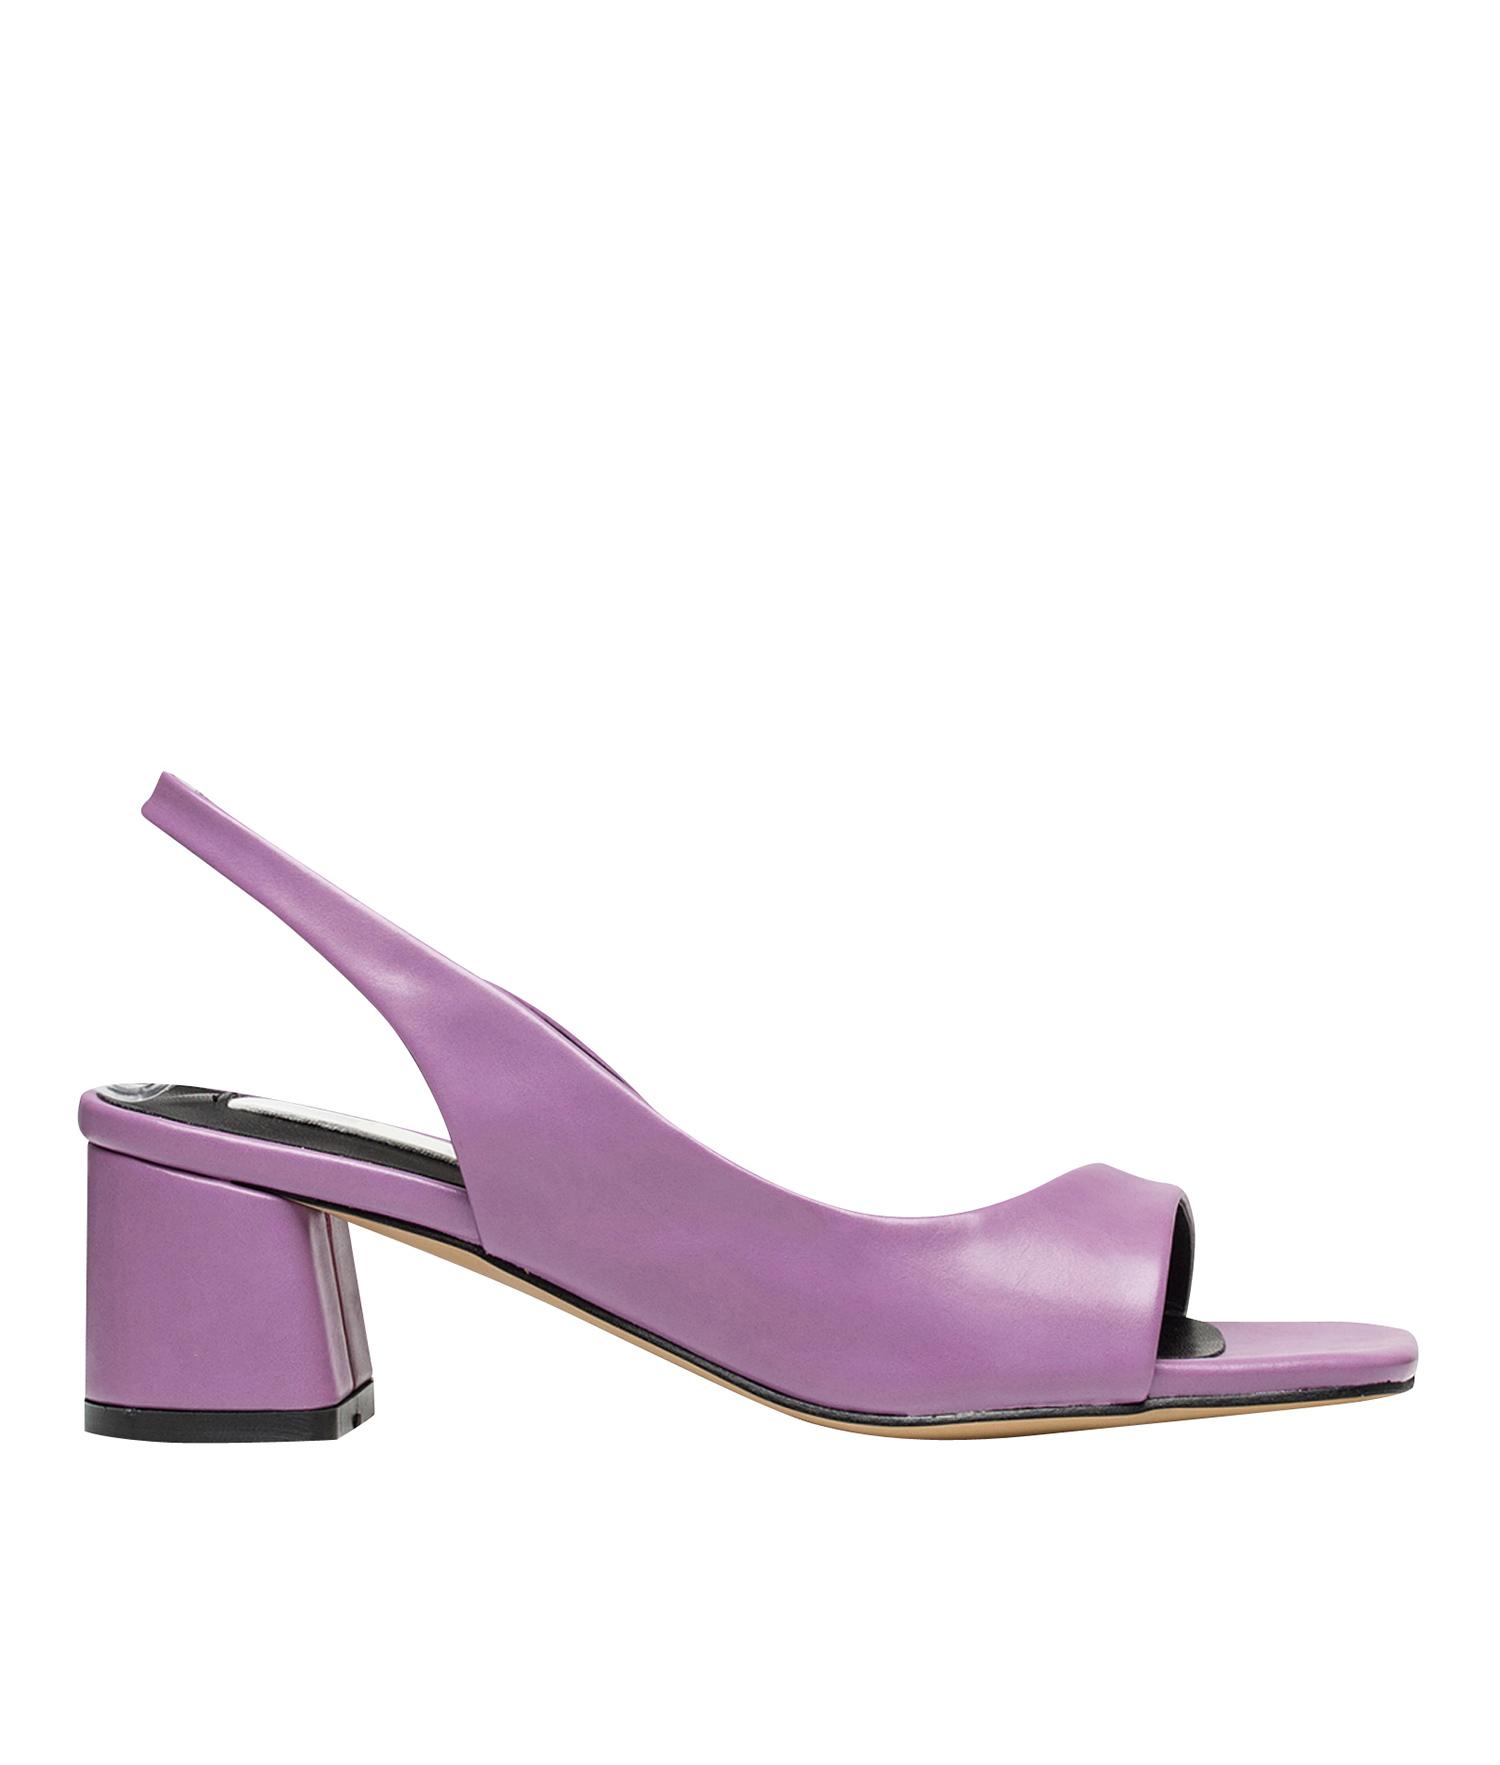 3af5f3ffd5c AnnaKastle Womens Dorsay Slingback Low Heel Dress Sandals Purple